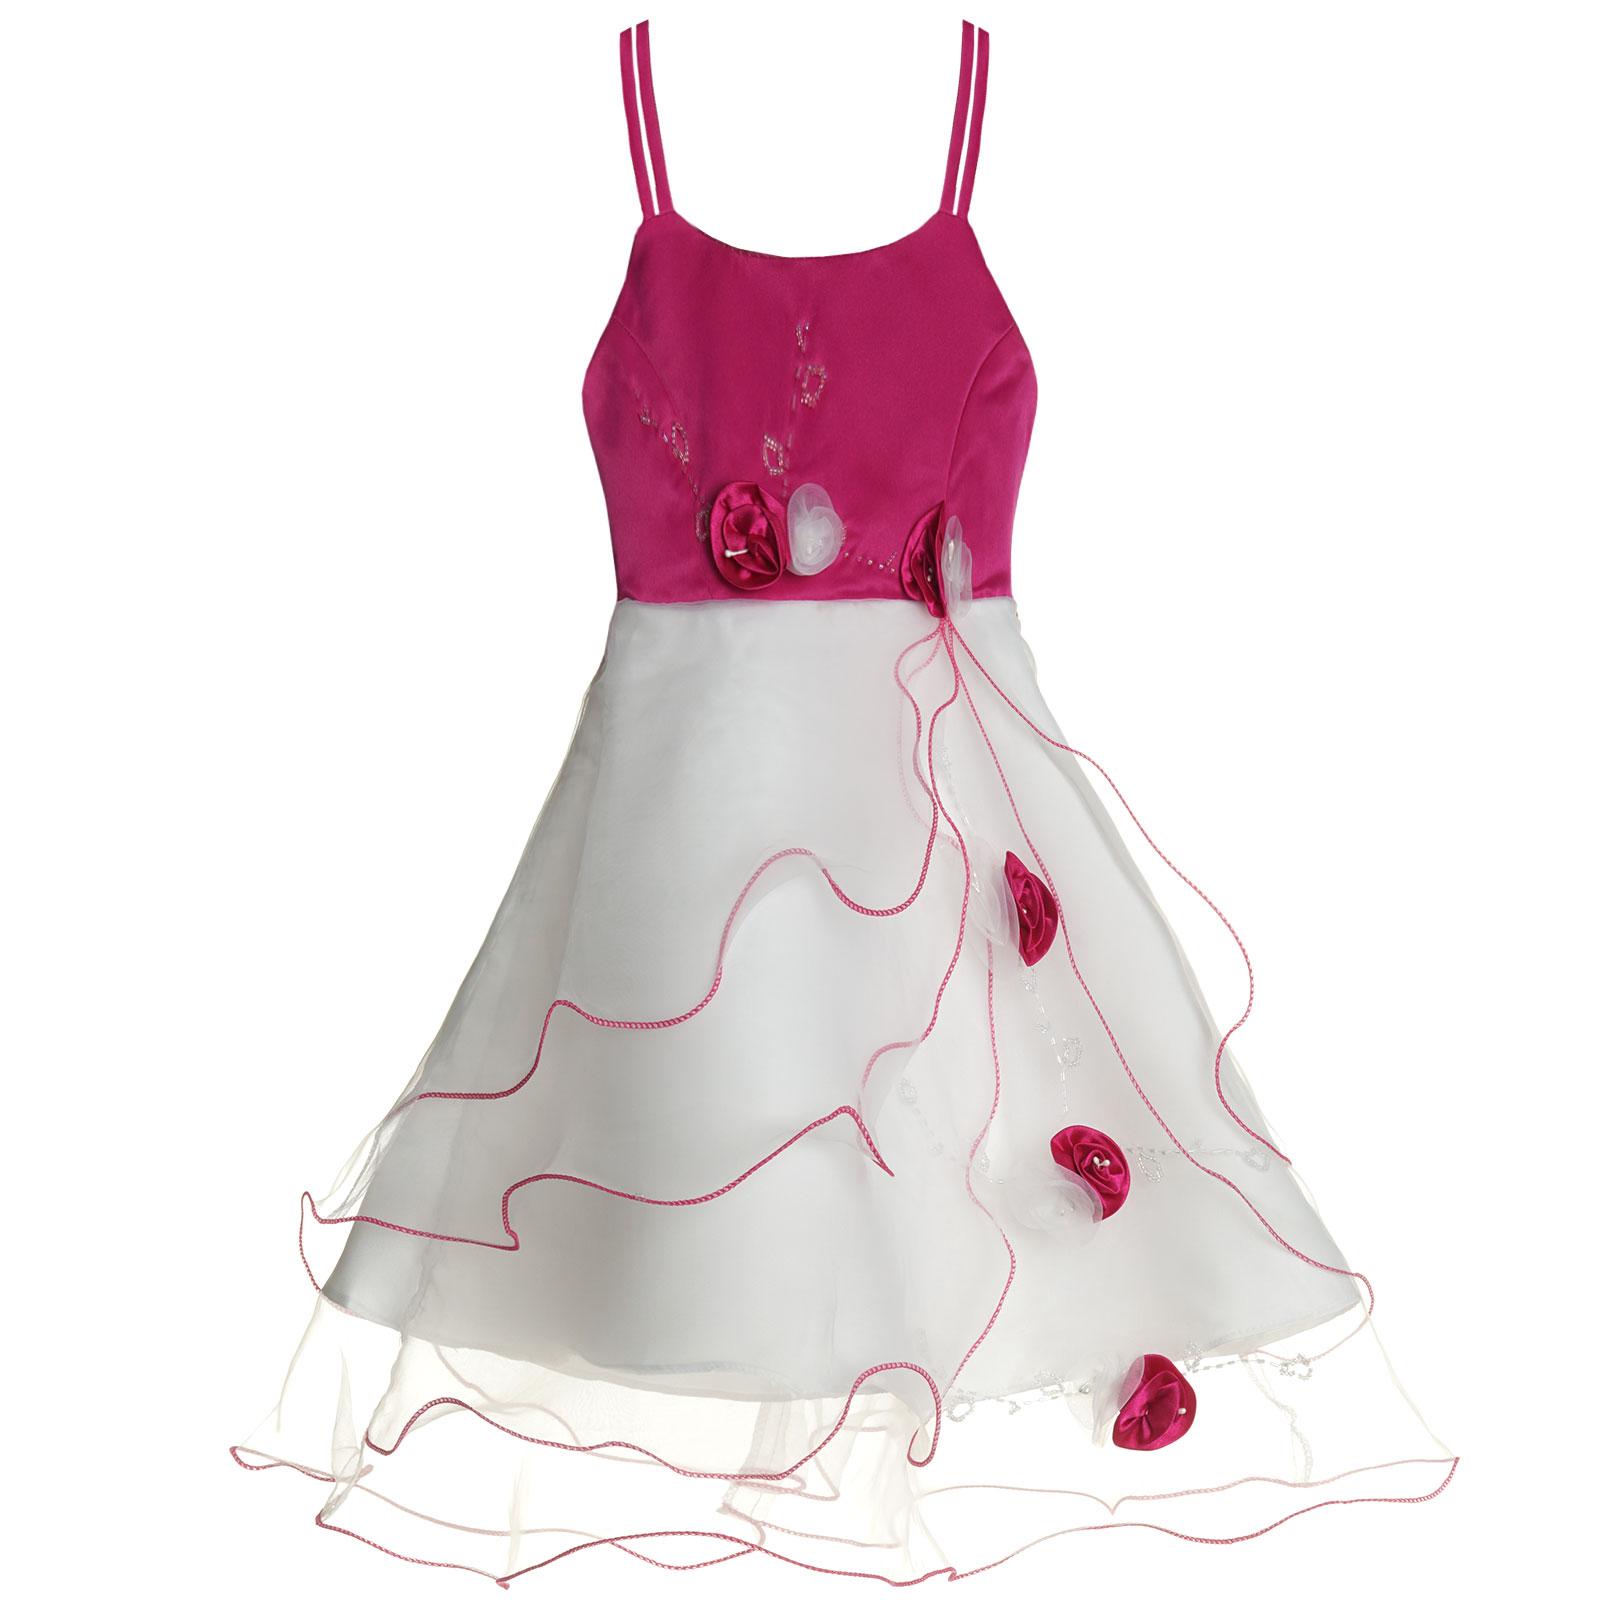 Maedchen-Kinder-Kleid-Peticoat-Festkleid-Lang-Arm-Kostuem-mit-Bolero-Rose-21476 Indexbild 12